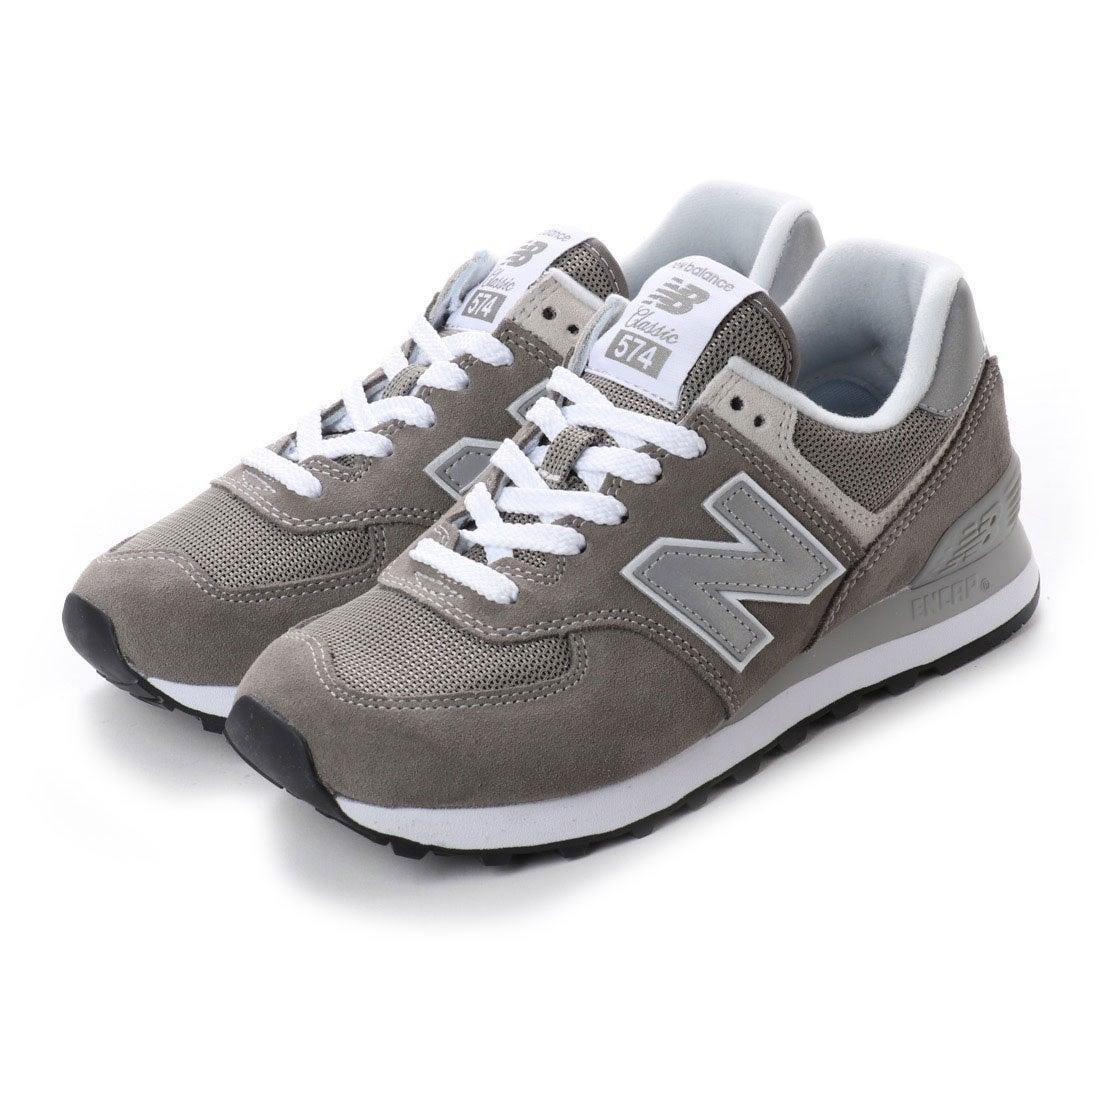 bbab525f1cb70 ニューバランス new balance NB ML574 EGG (EGG(グレー)) -靴&ファッション通販 ロコンド〜自宅で試着、気軽に返品